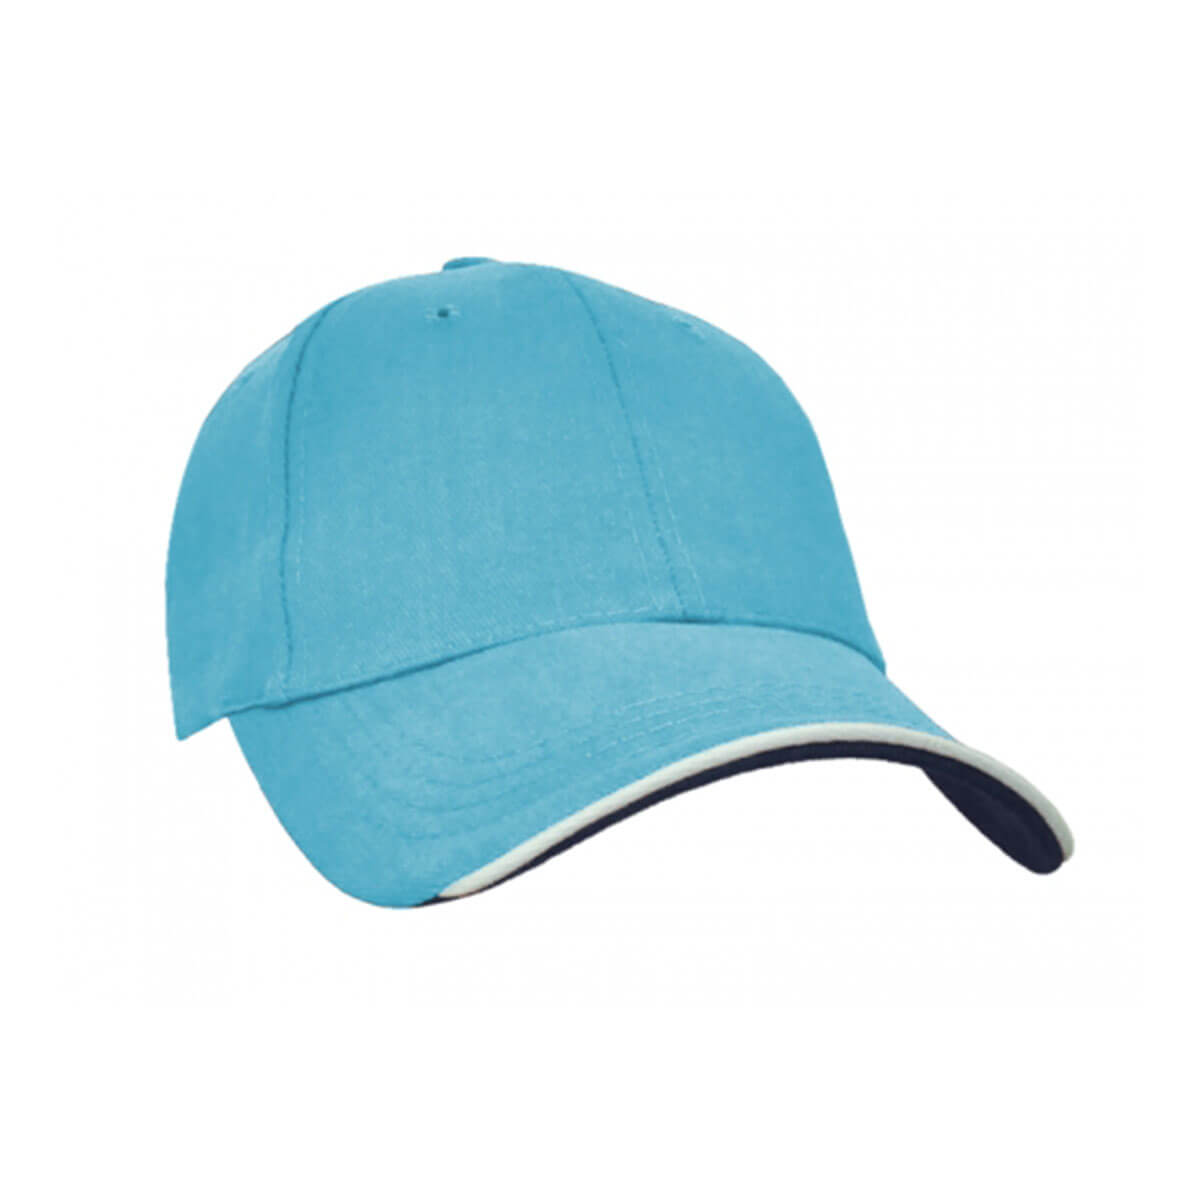 Navigator Cap-Sky / White / Navy